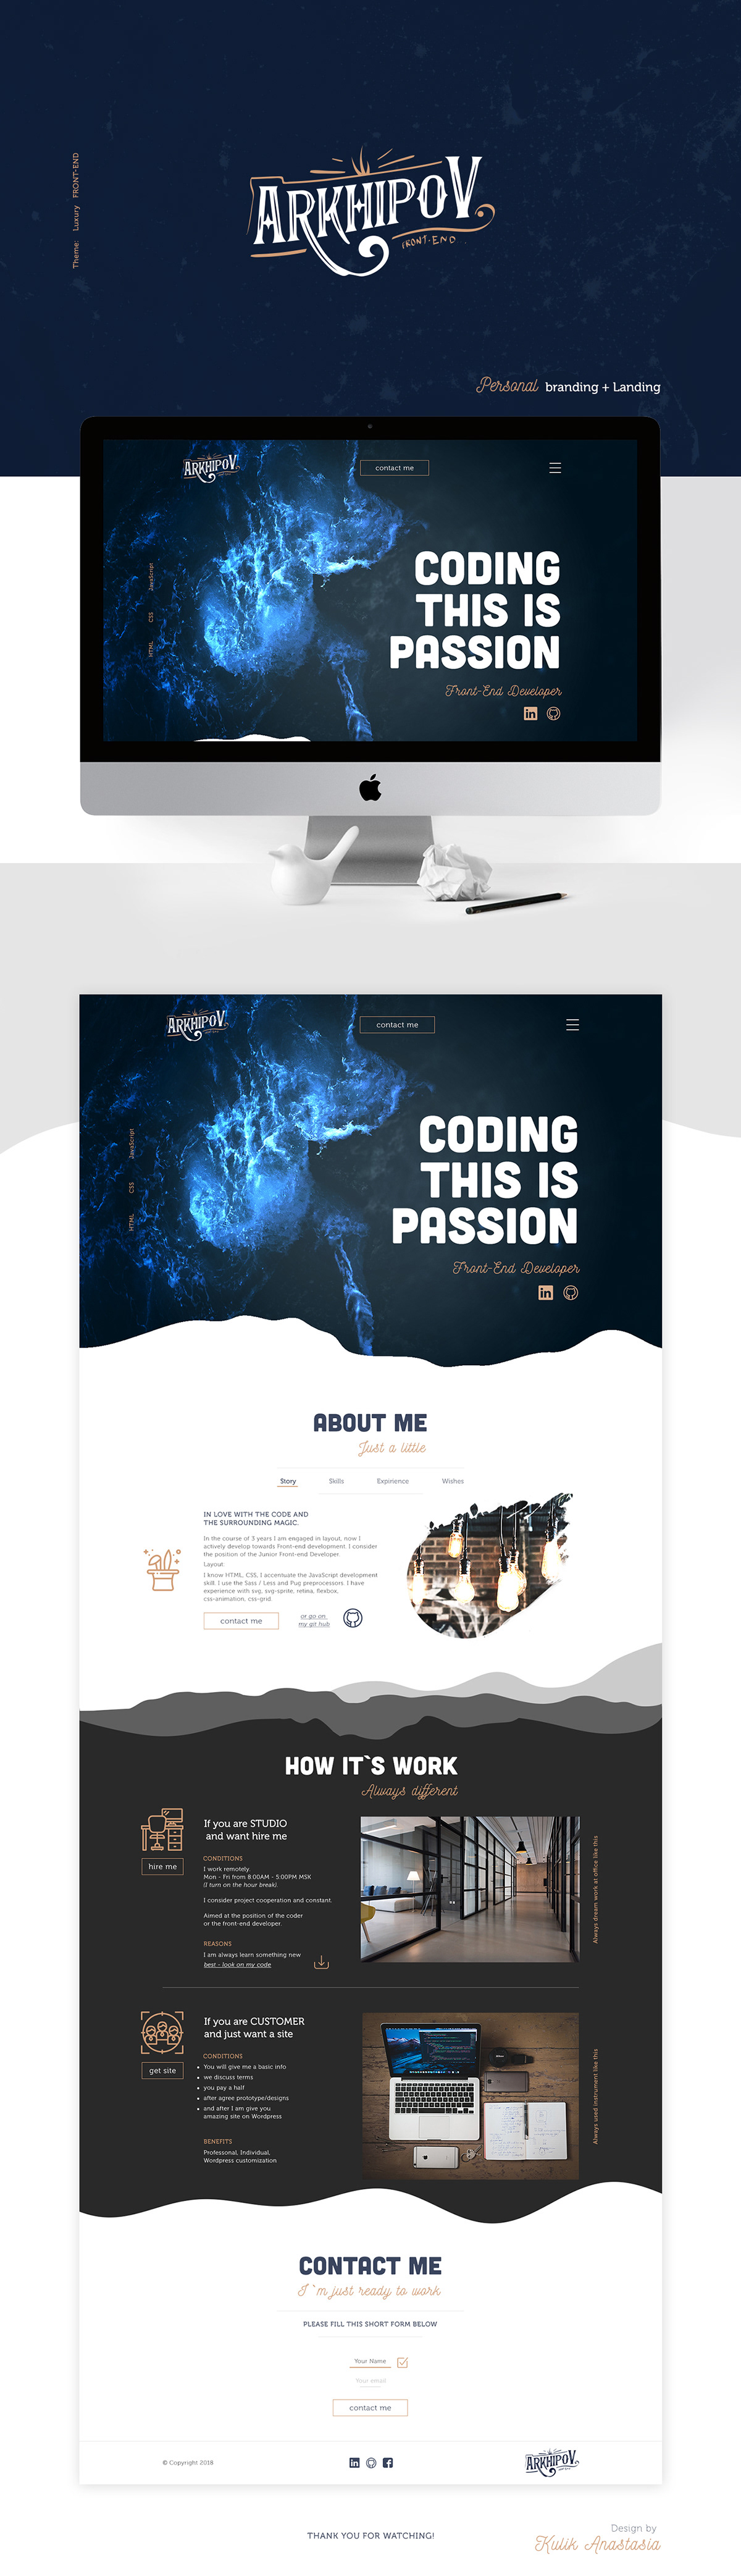 Personal branding  Front-end developer  Web  Logo  on Wacom